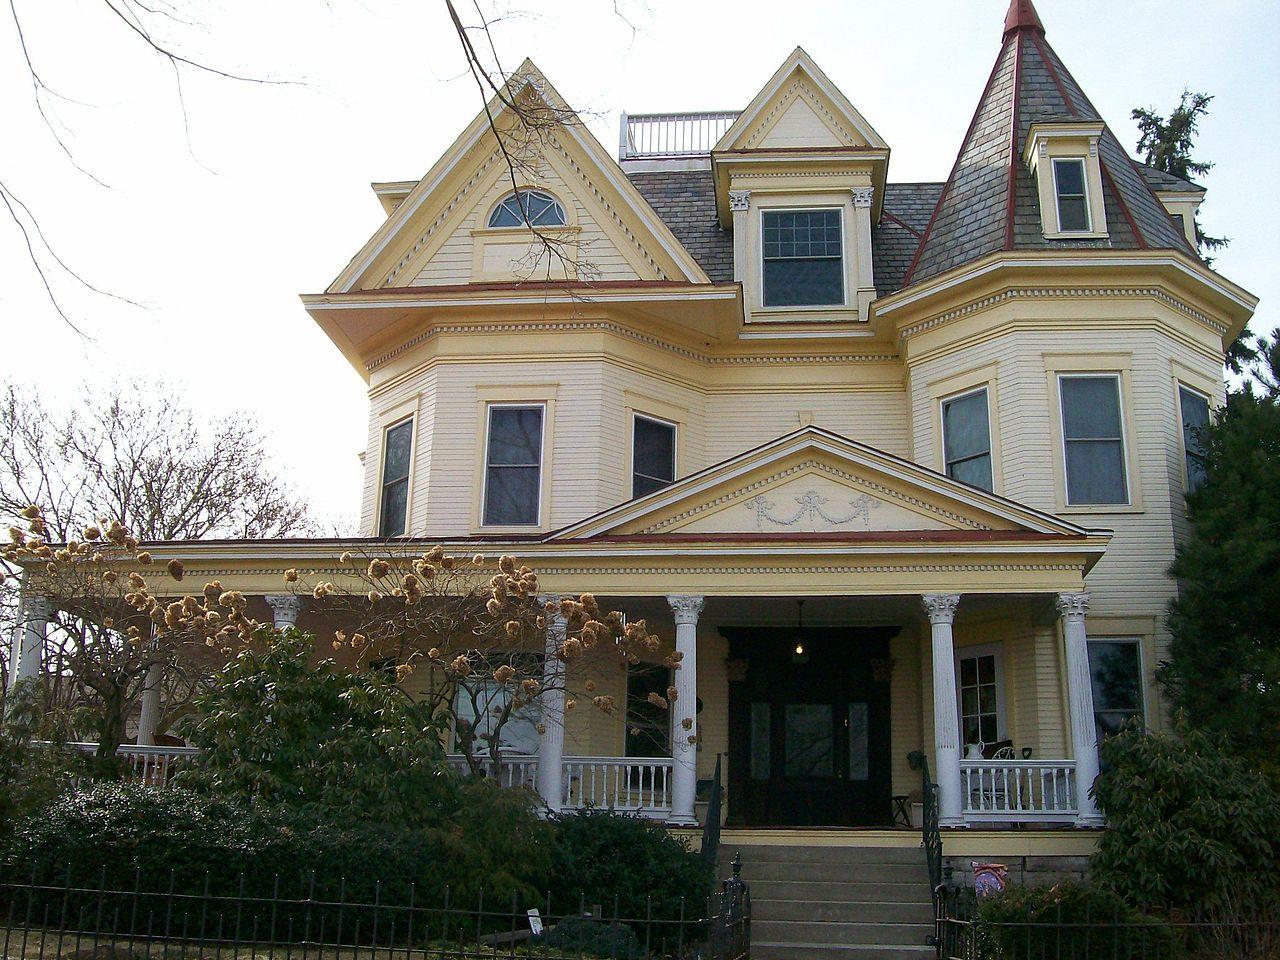 John Kaiser House in Washington County, Ohio. Washington